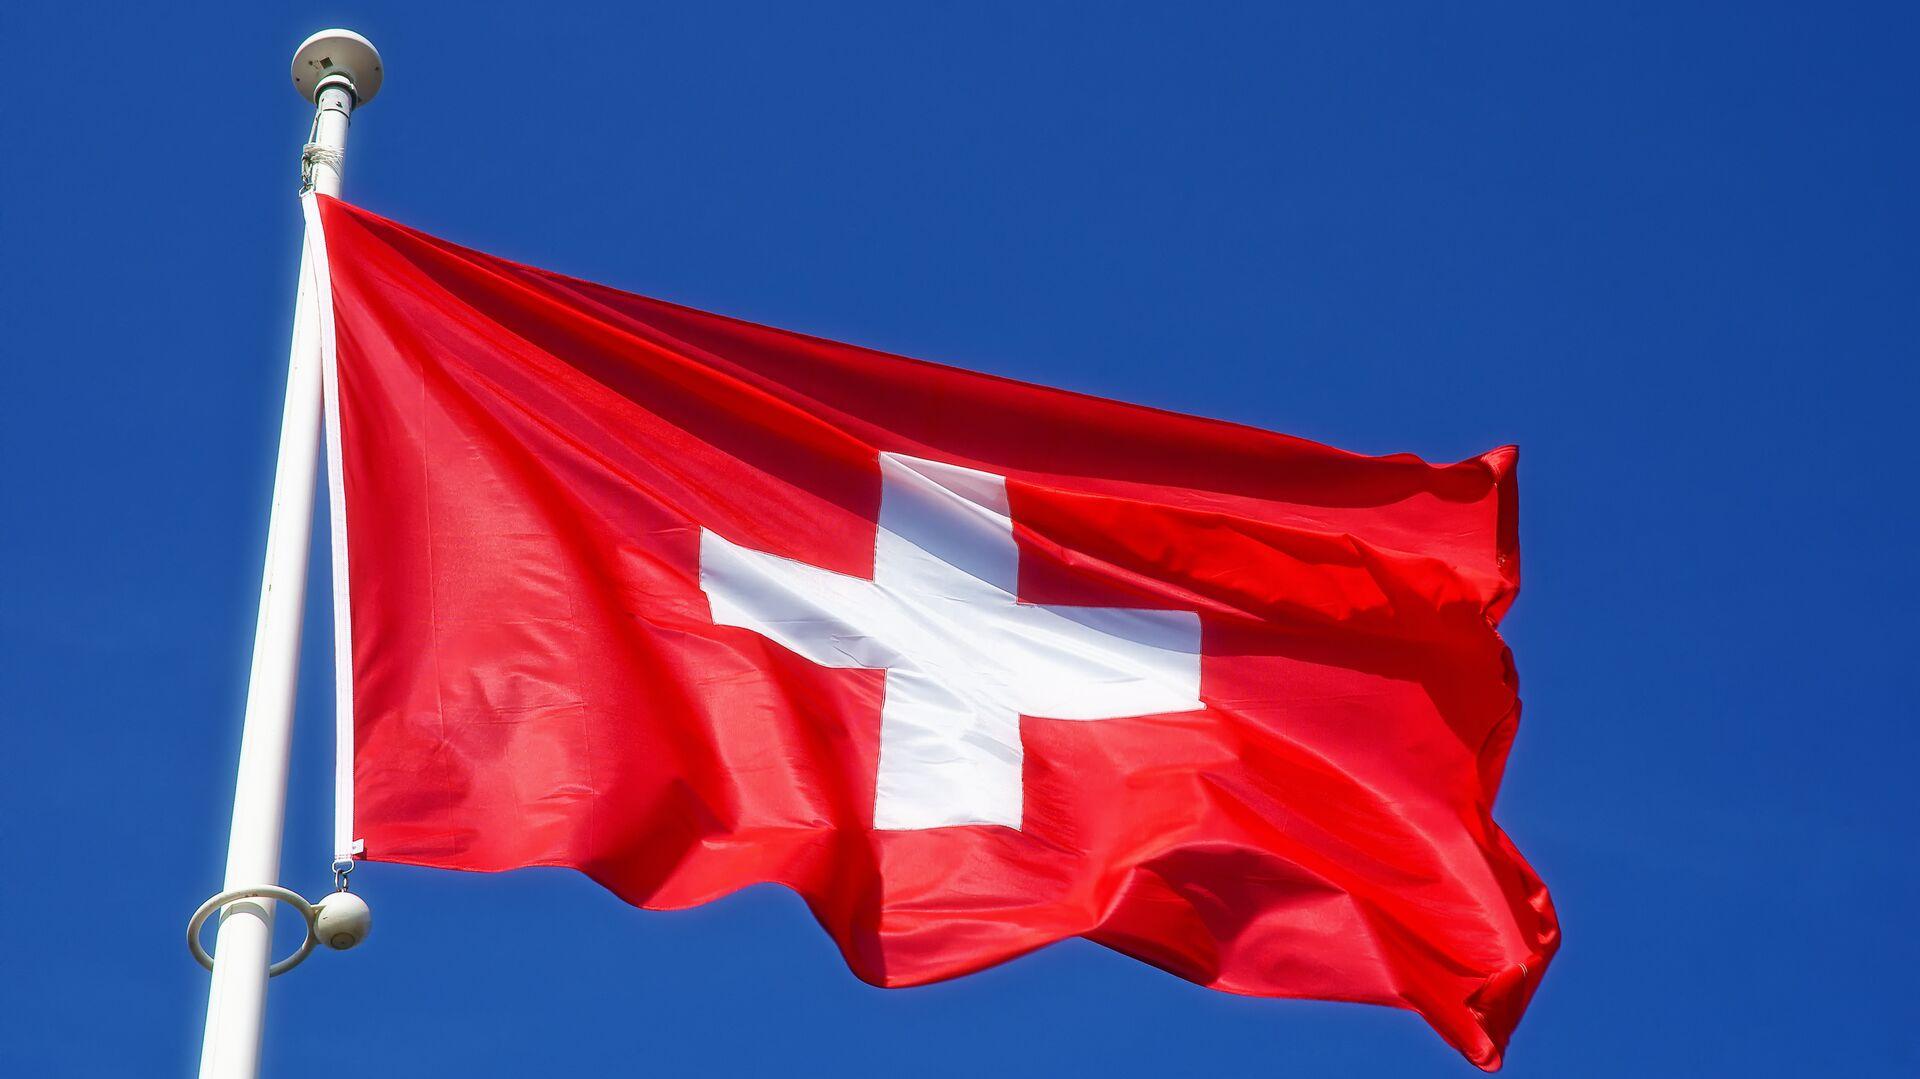 Флаг Швейцарии - РИА Новости, 1920, 27.07.2021